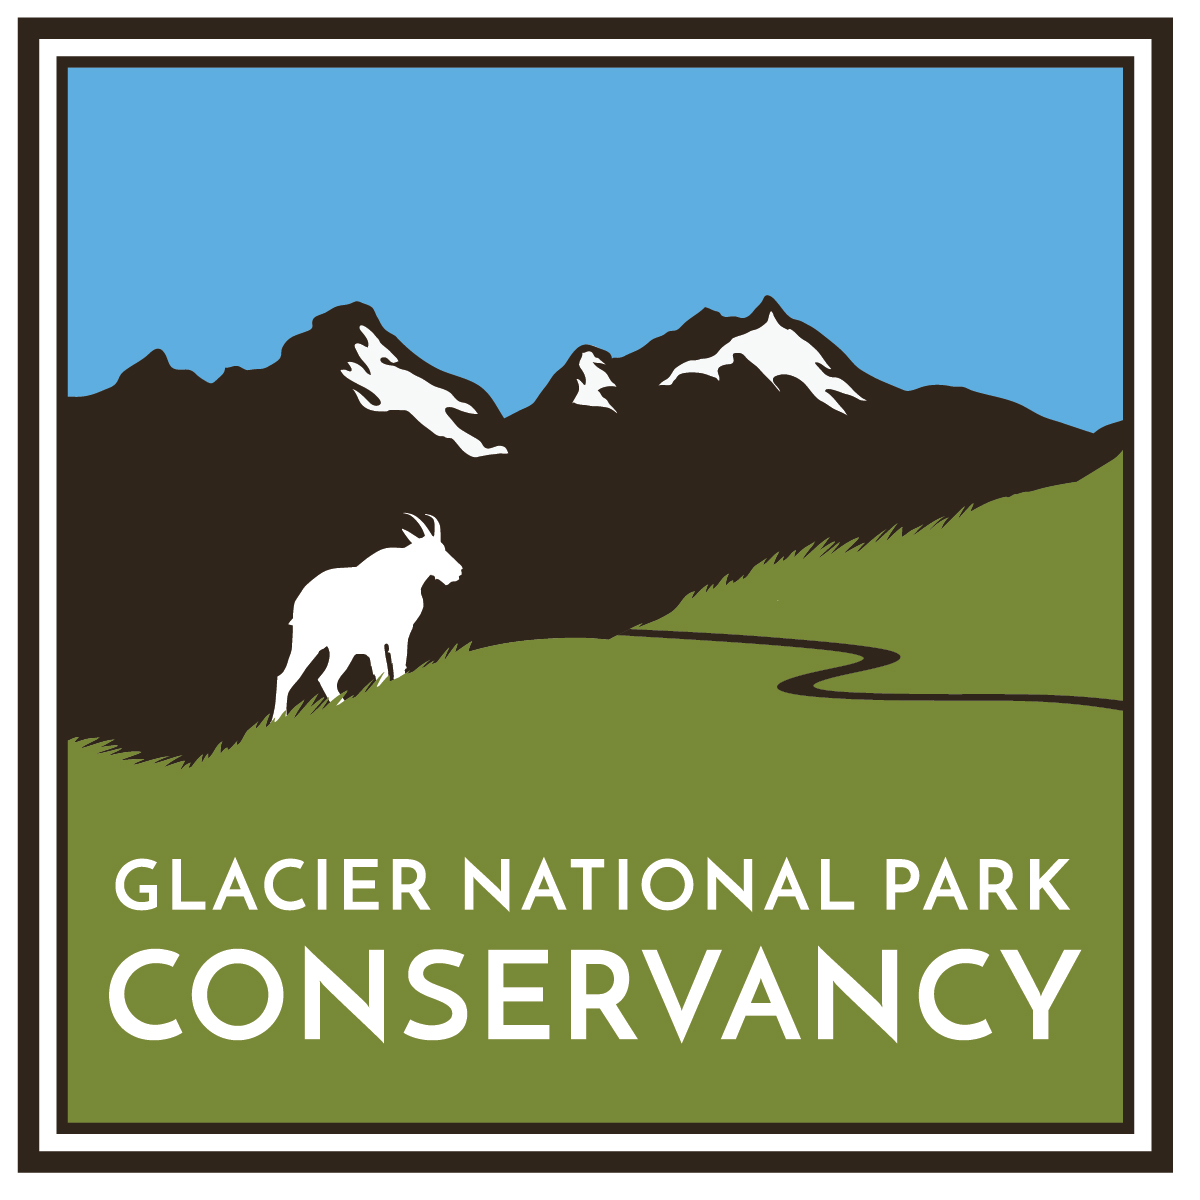 Glacier National Park Conservancy